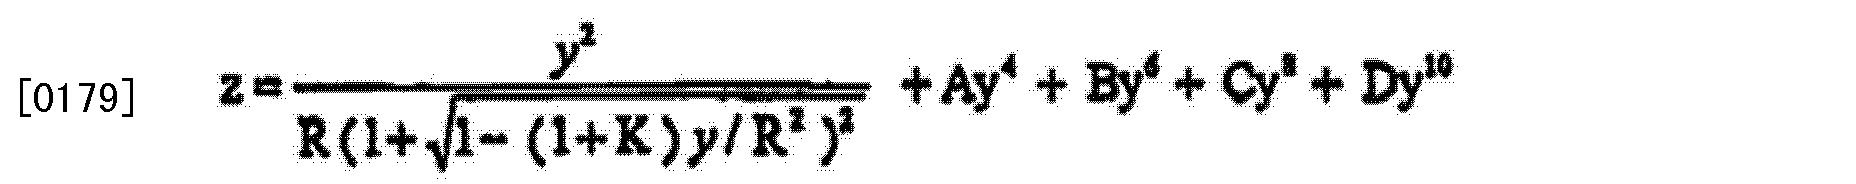 Figure CN103744170AD00122